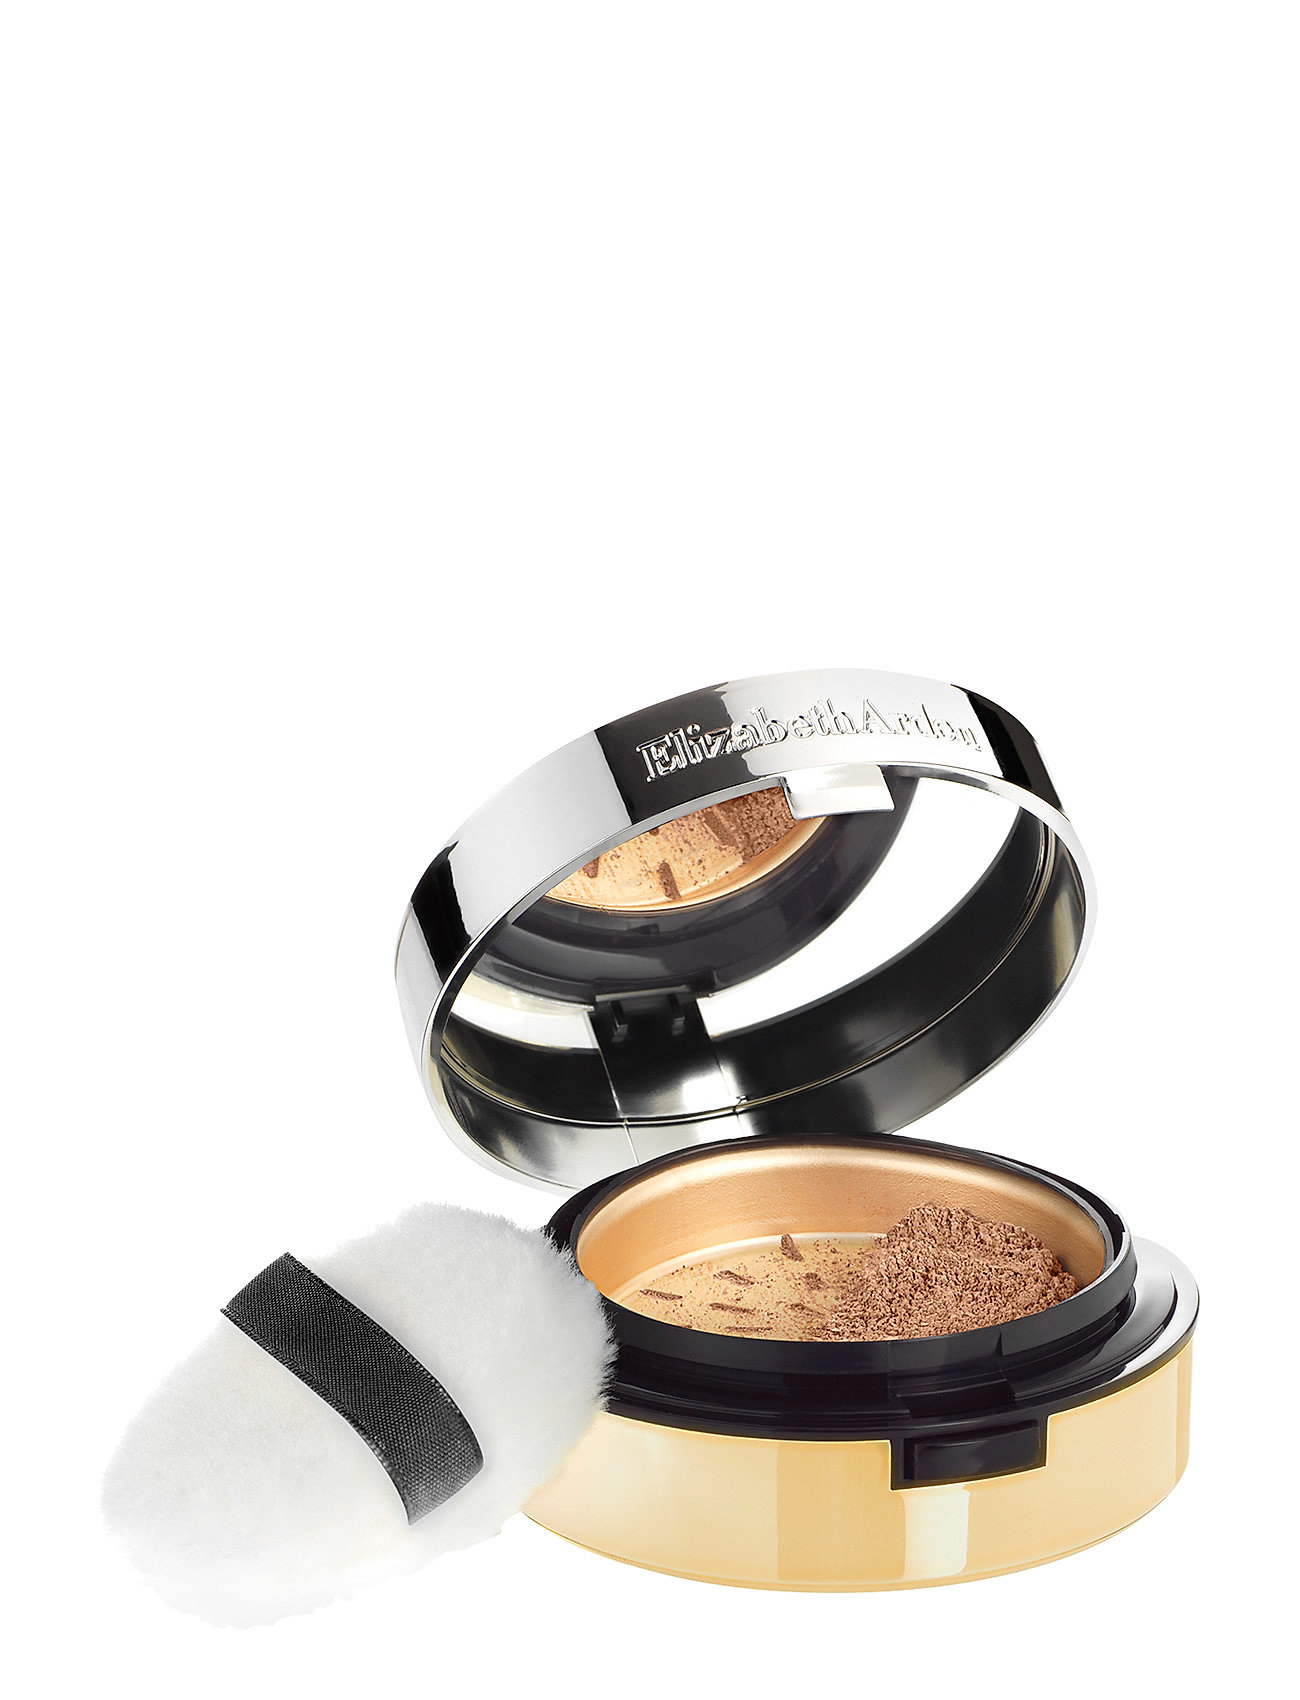 Image of Pure Finish Mineralfoundation 3 Pure Finish Pudder Makeup ELIZABETH ARDEN (3158633285)